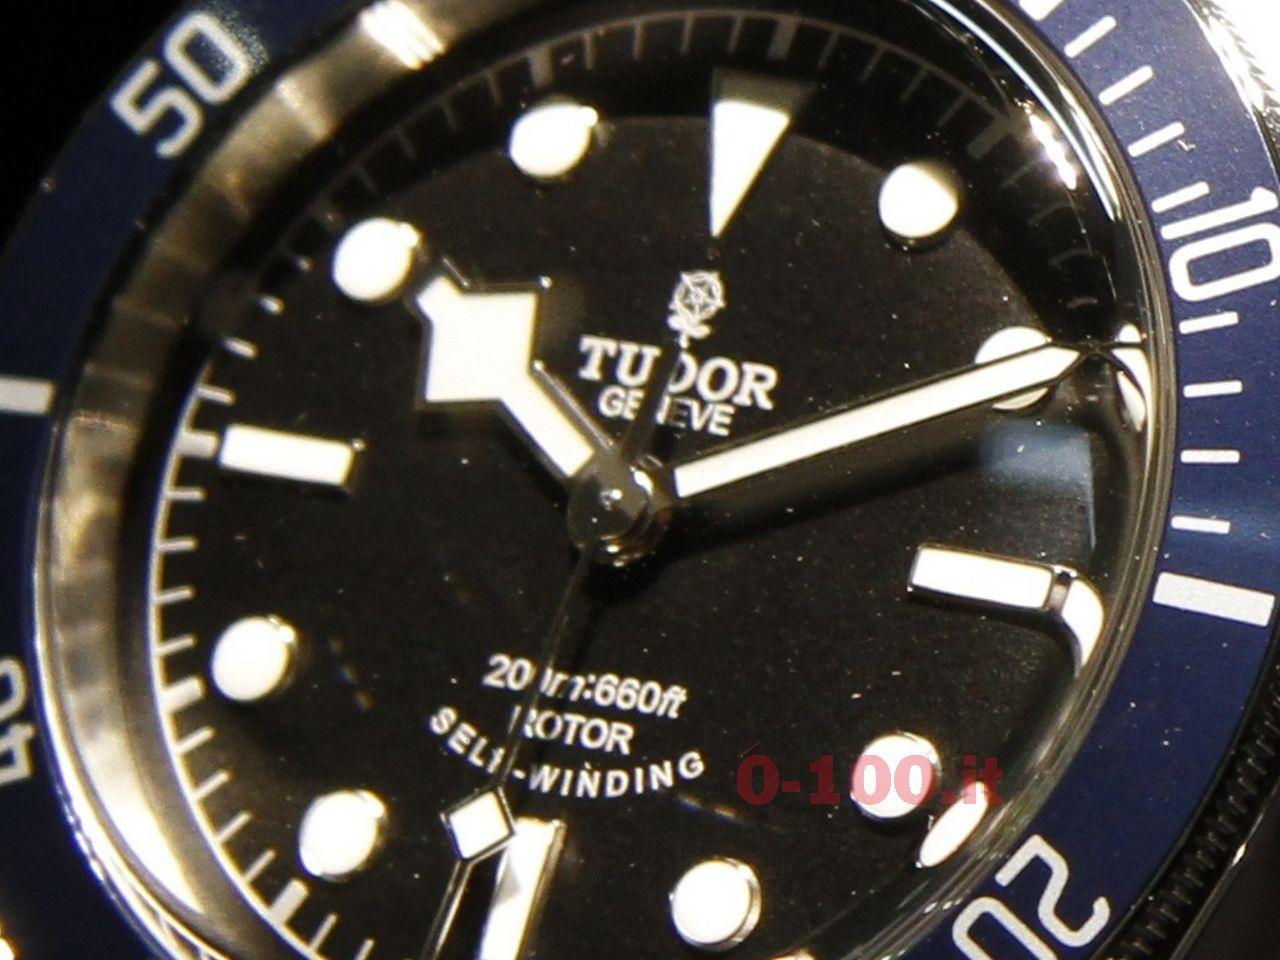 Baselworld2014_Tudor Heritage Black Bay Ref. 79220B-0-1005